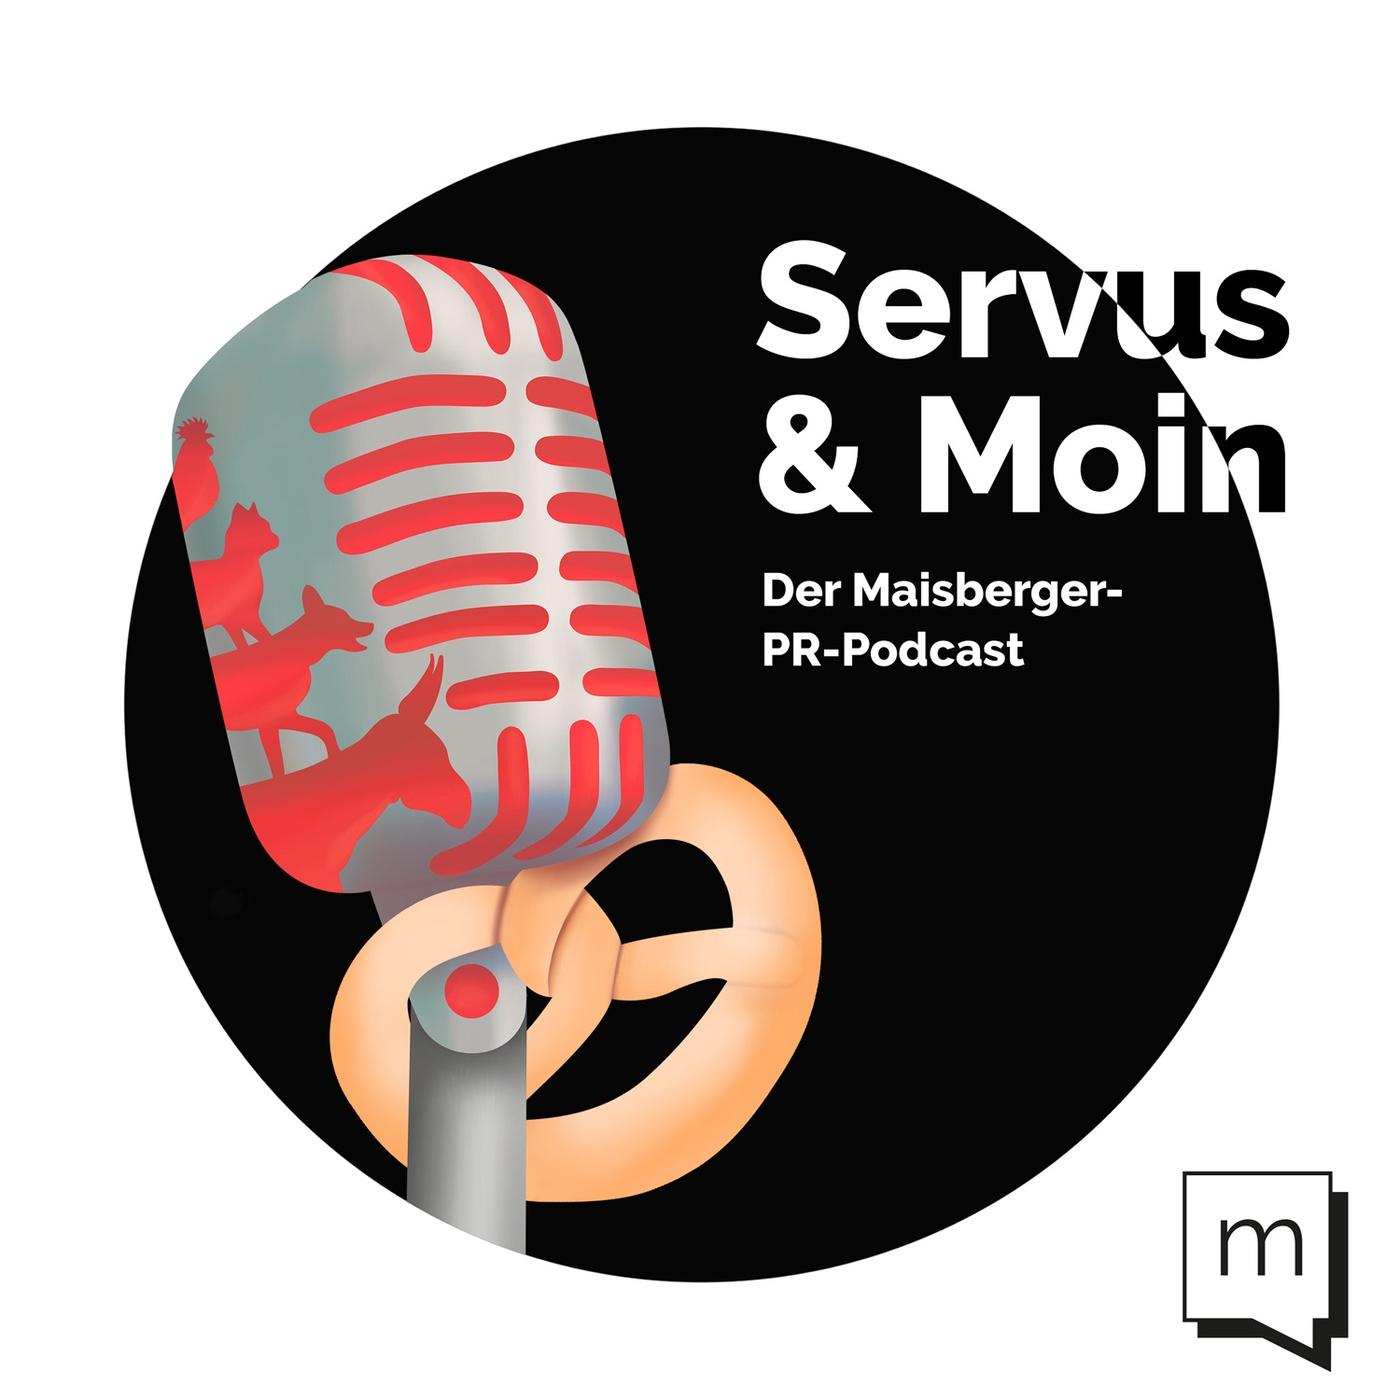 #Episode 0: Servus & Moin.